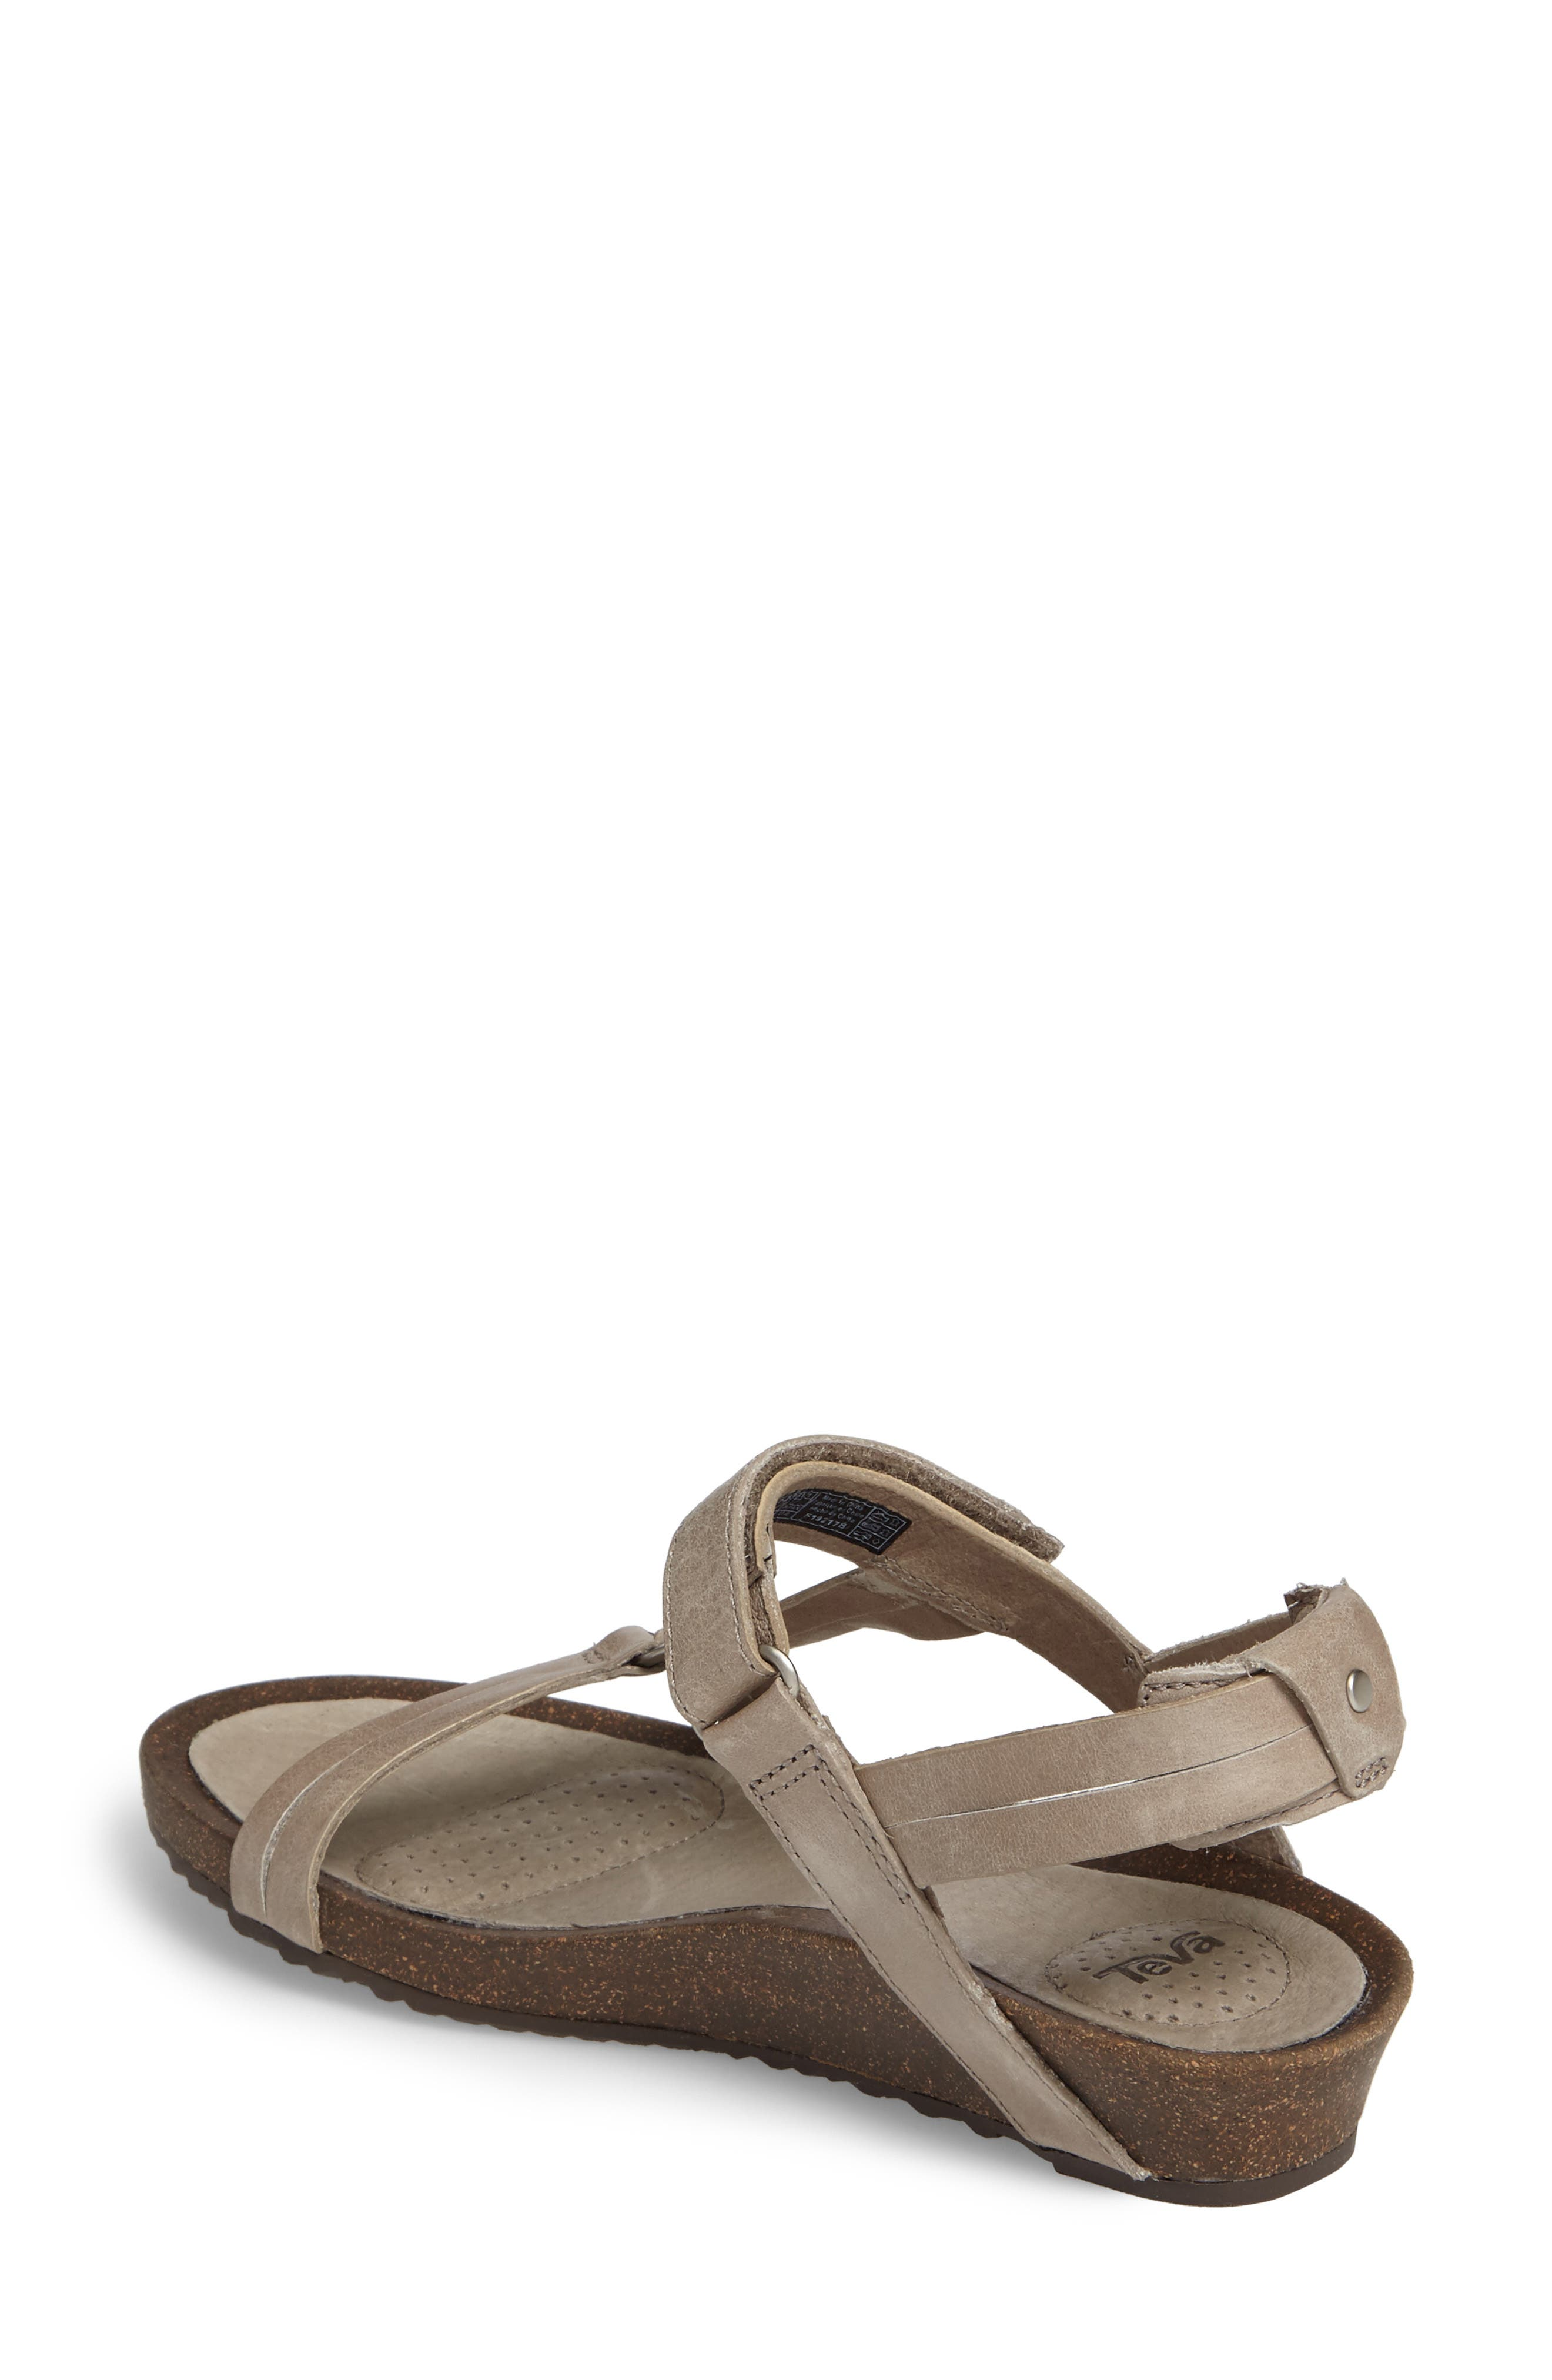 Ysidro Universal Sandal,                             Alternate thumbnail 2, color,                             026